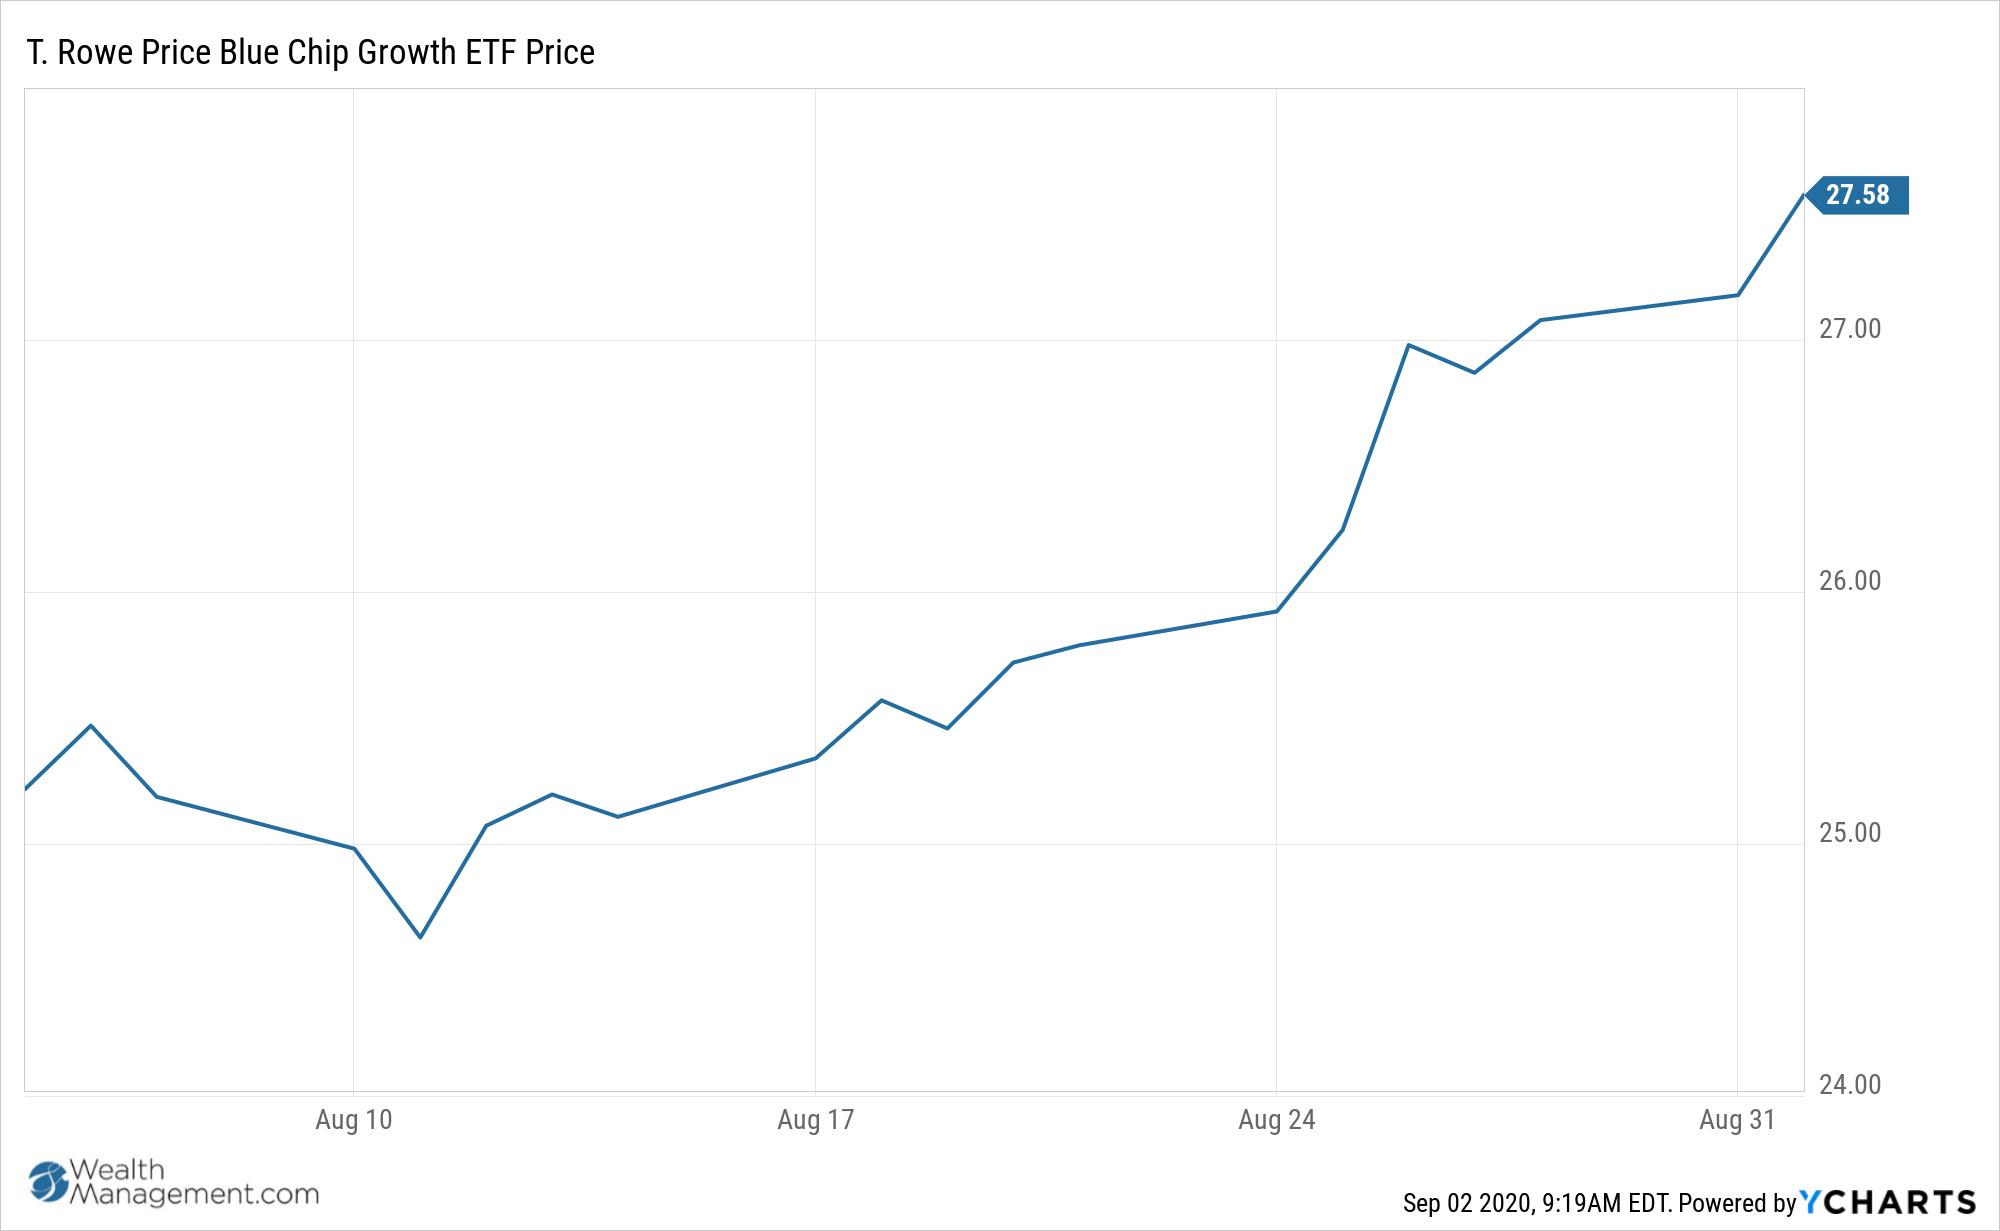 TCHP Chart